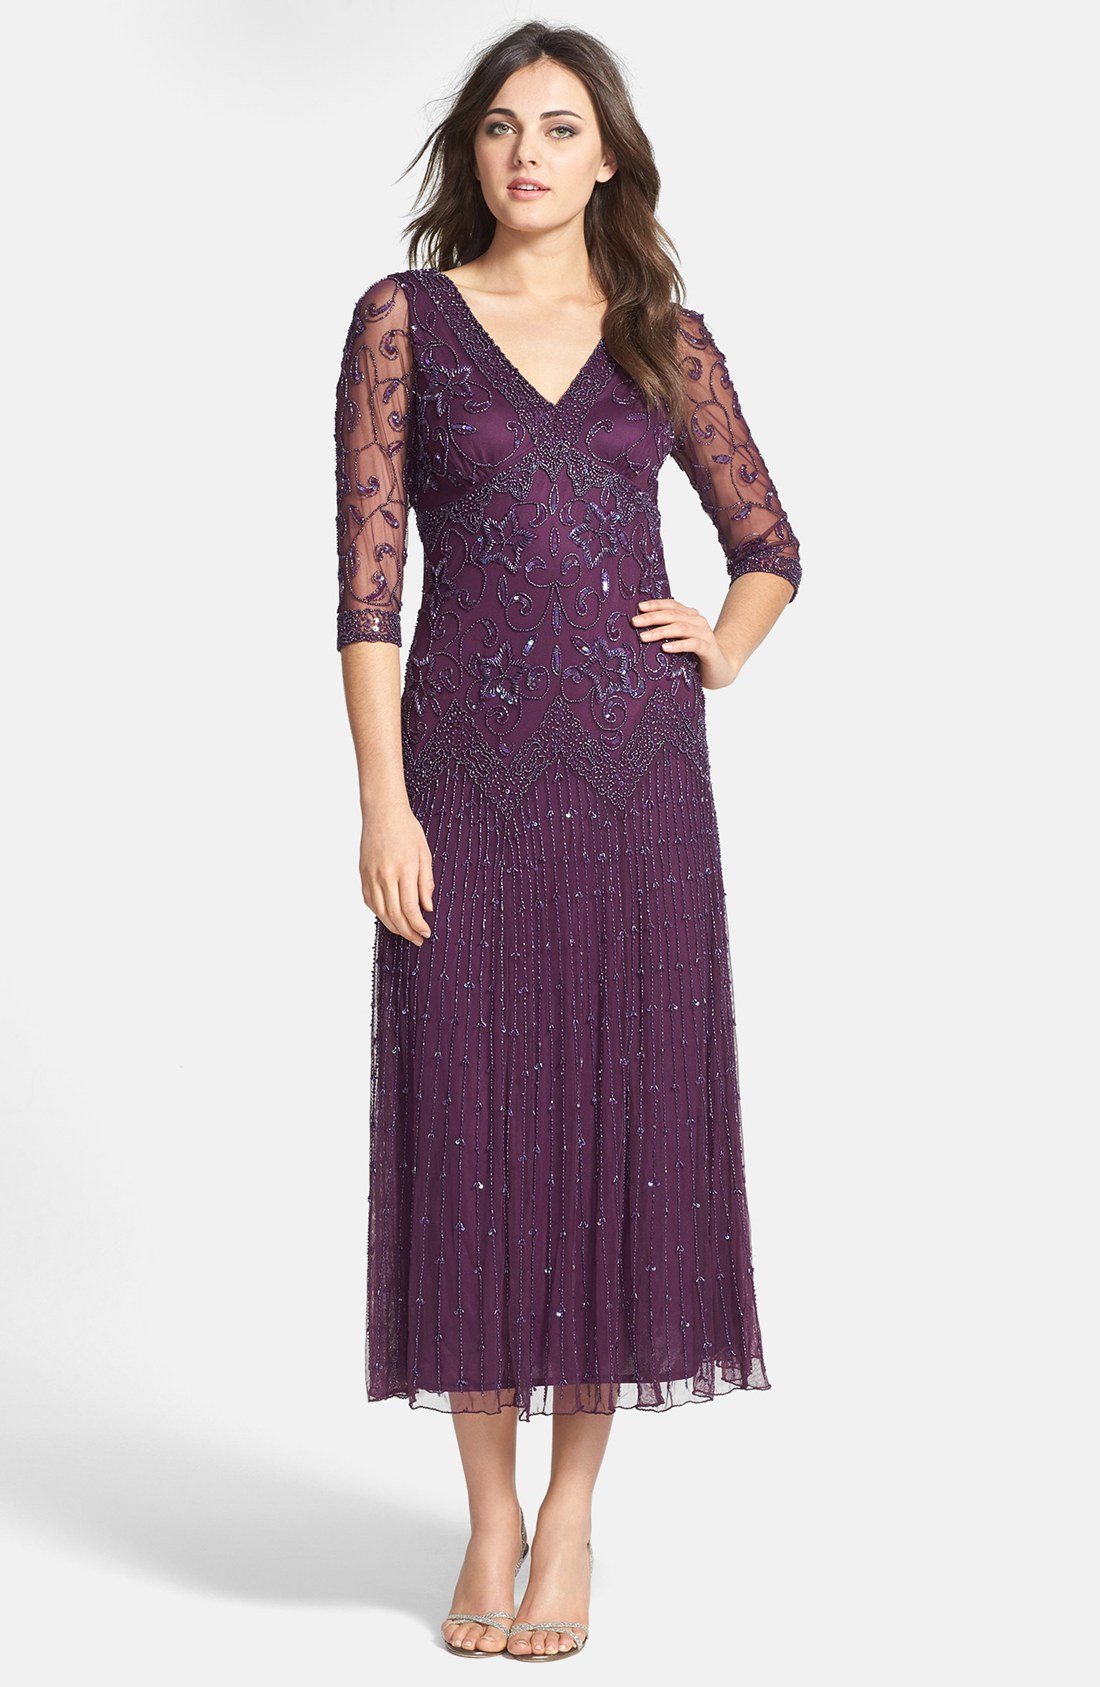 Pisarro Nights Beaded Mesh Dress In Purple Plum Lyst